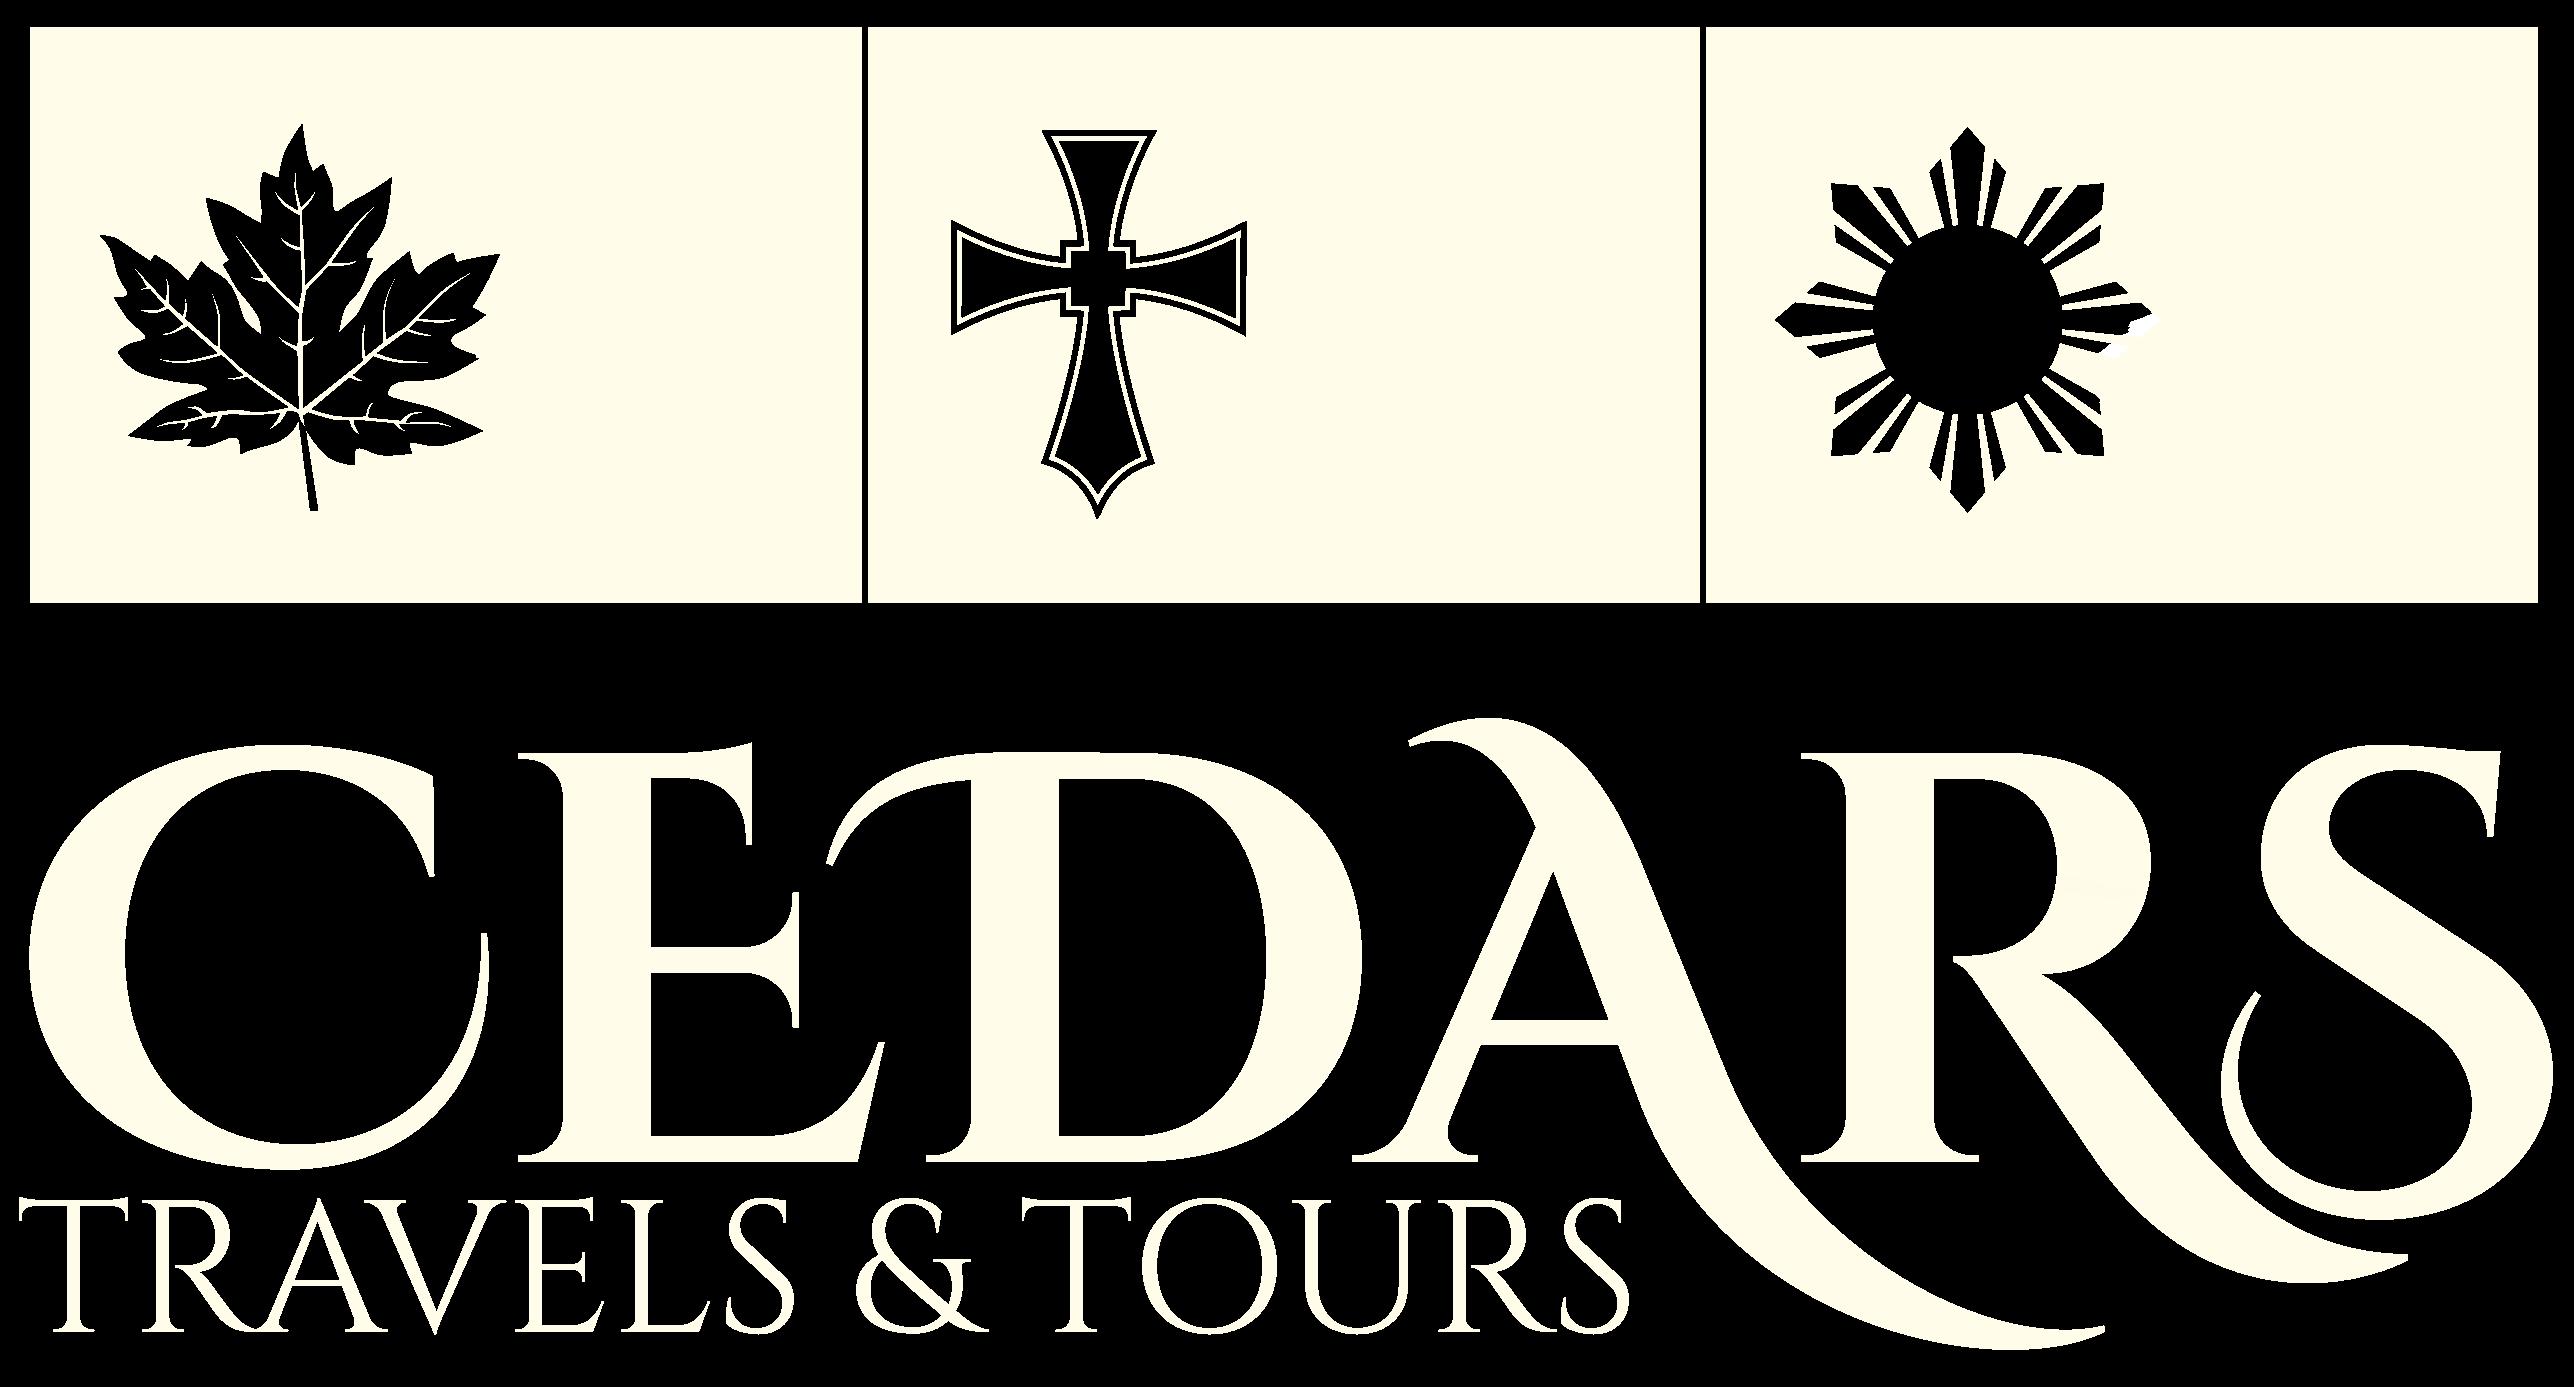 Cedars Travel